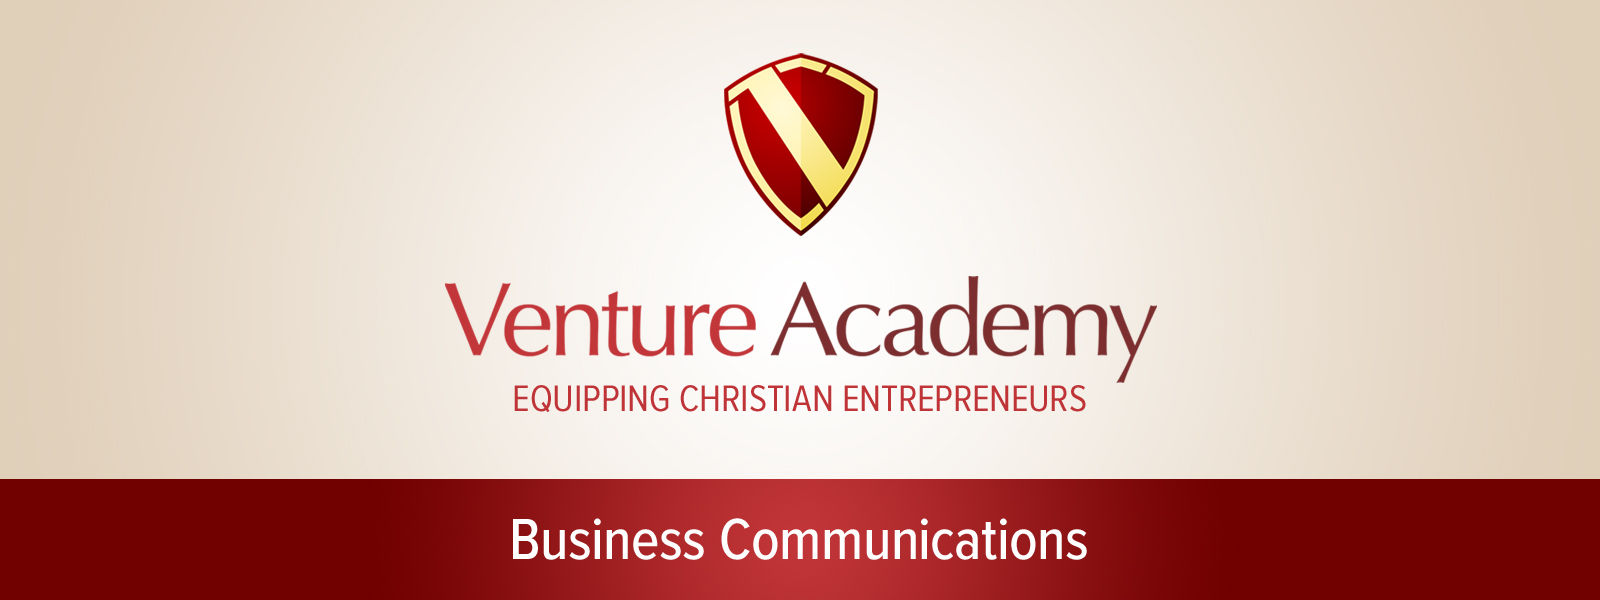 8) Business Communications